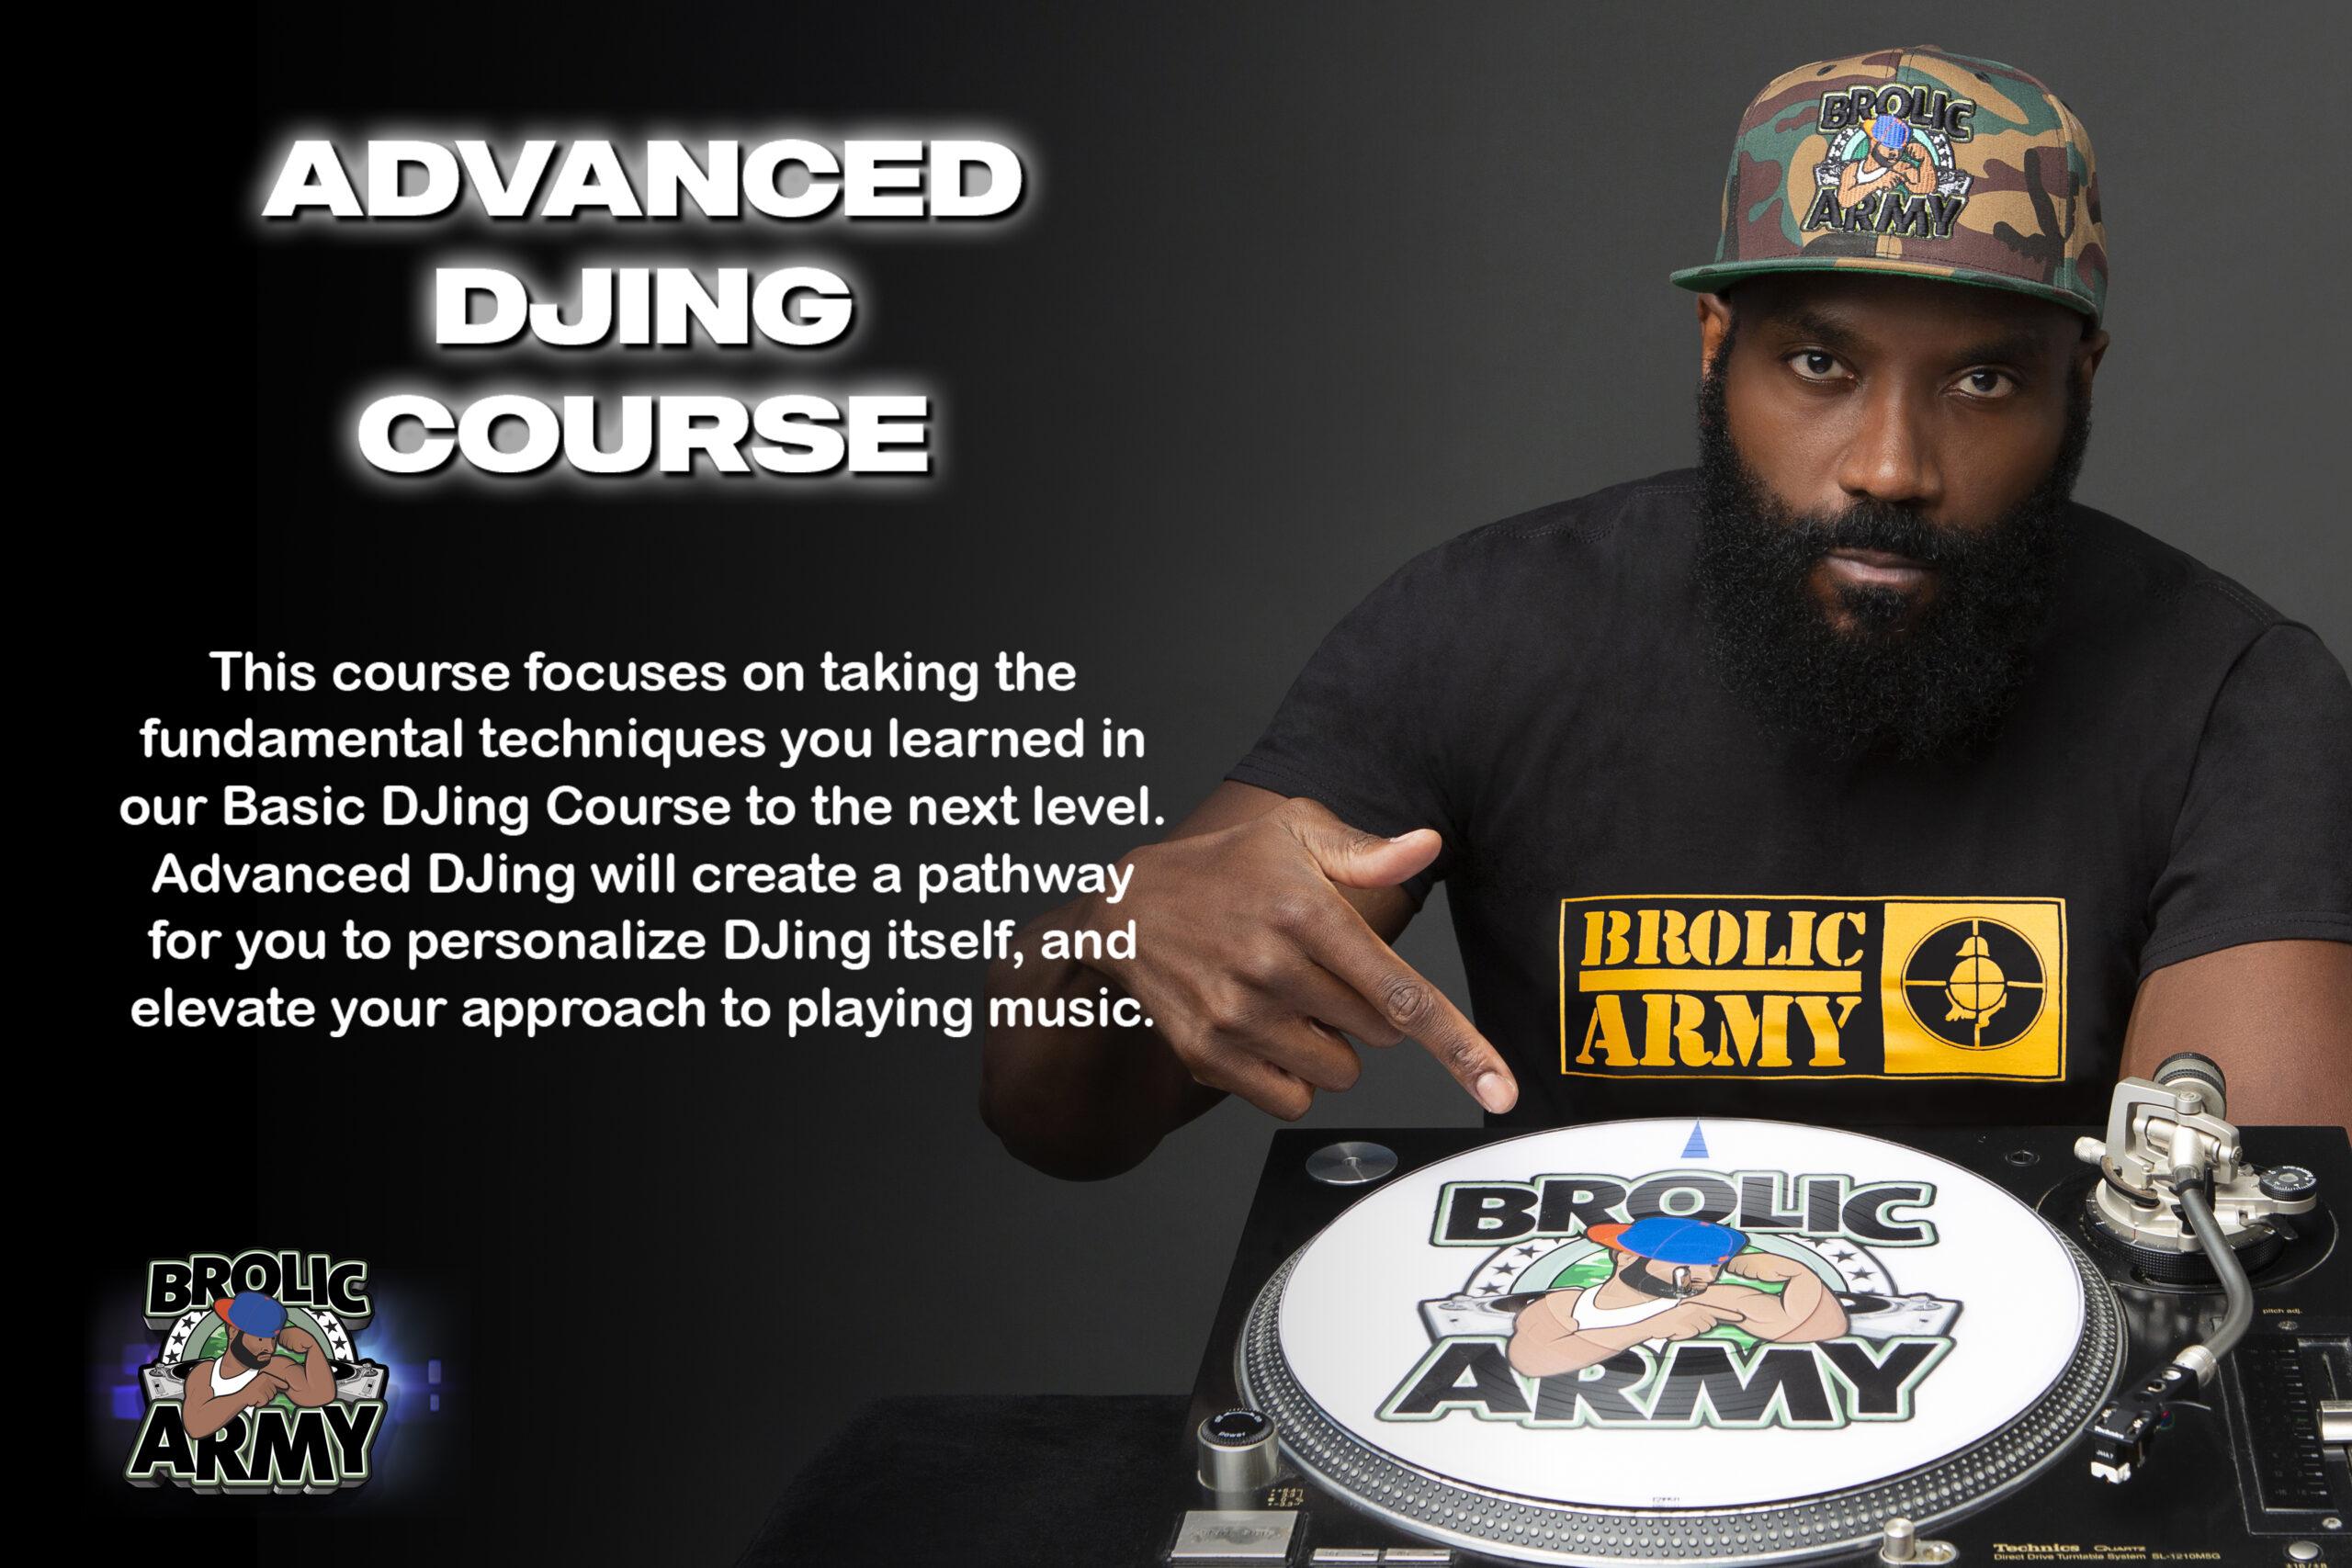 Advanced DJing Course Group